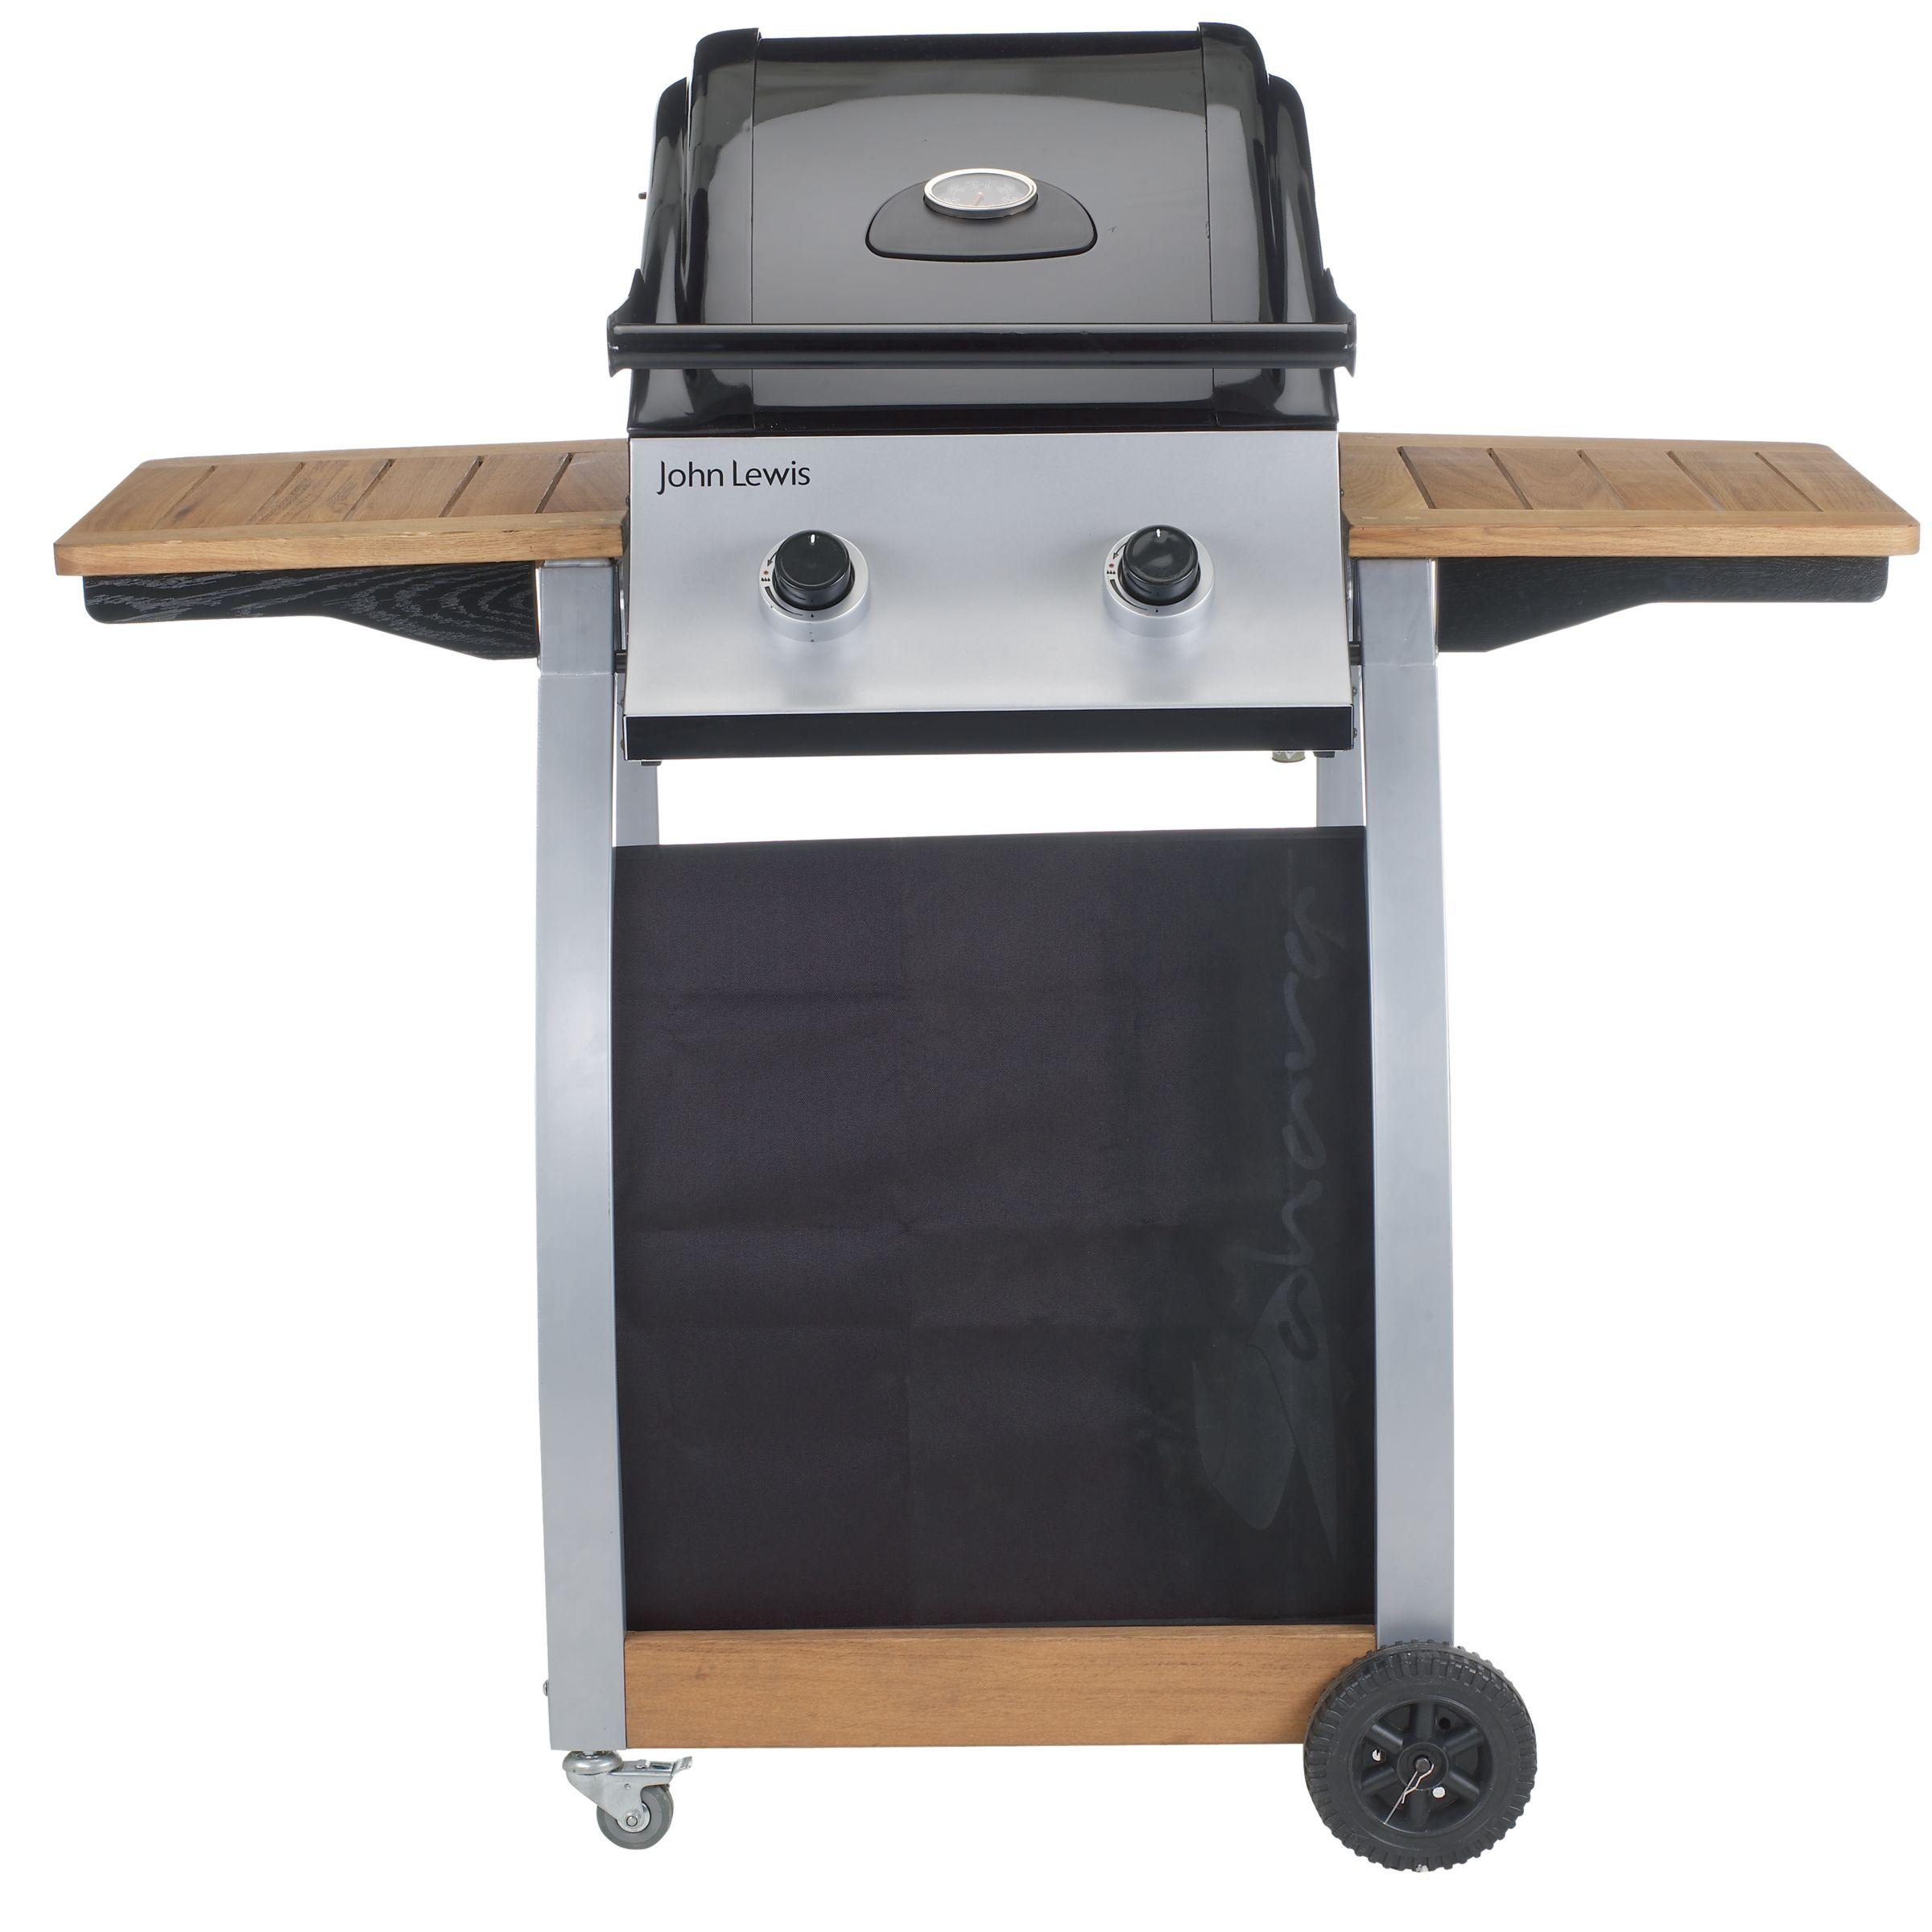 John Lewis JHL2B2 2-Burner Gas Barbecue, Hooded